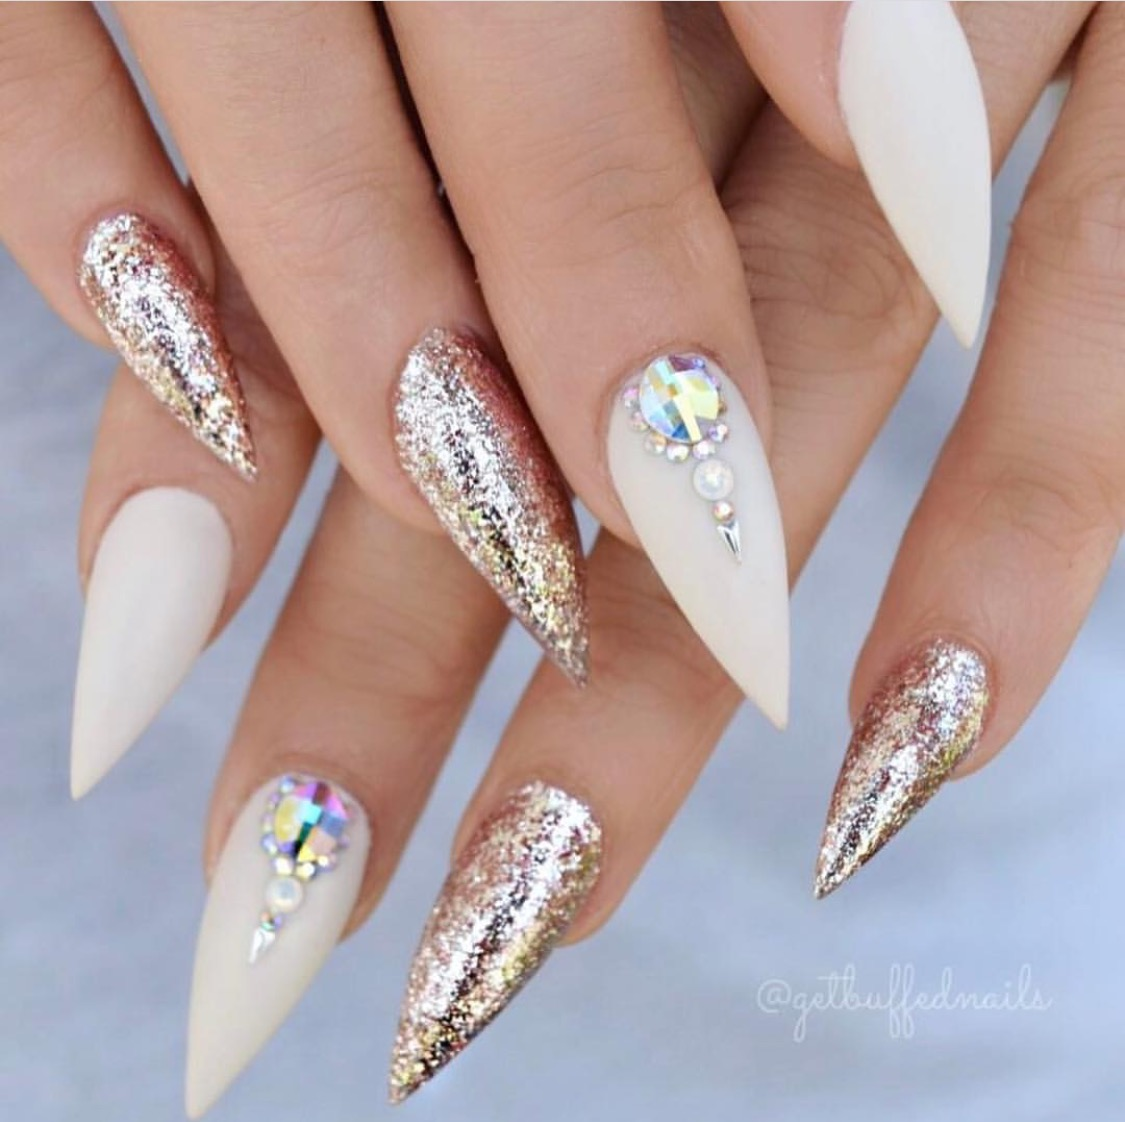 Beautiful Nail Art: Beautiful Nail Art By Get Buffed Nails